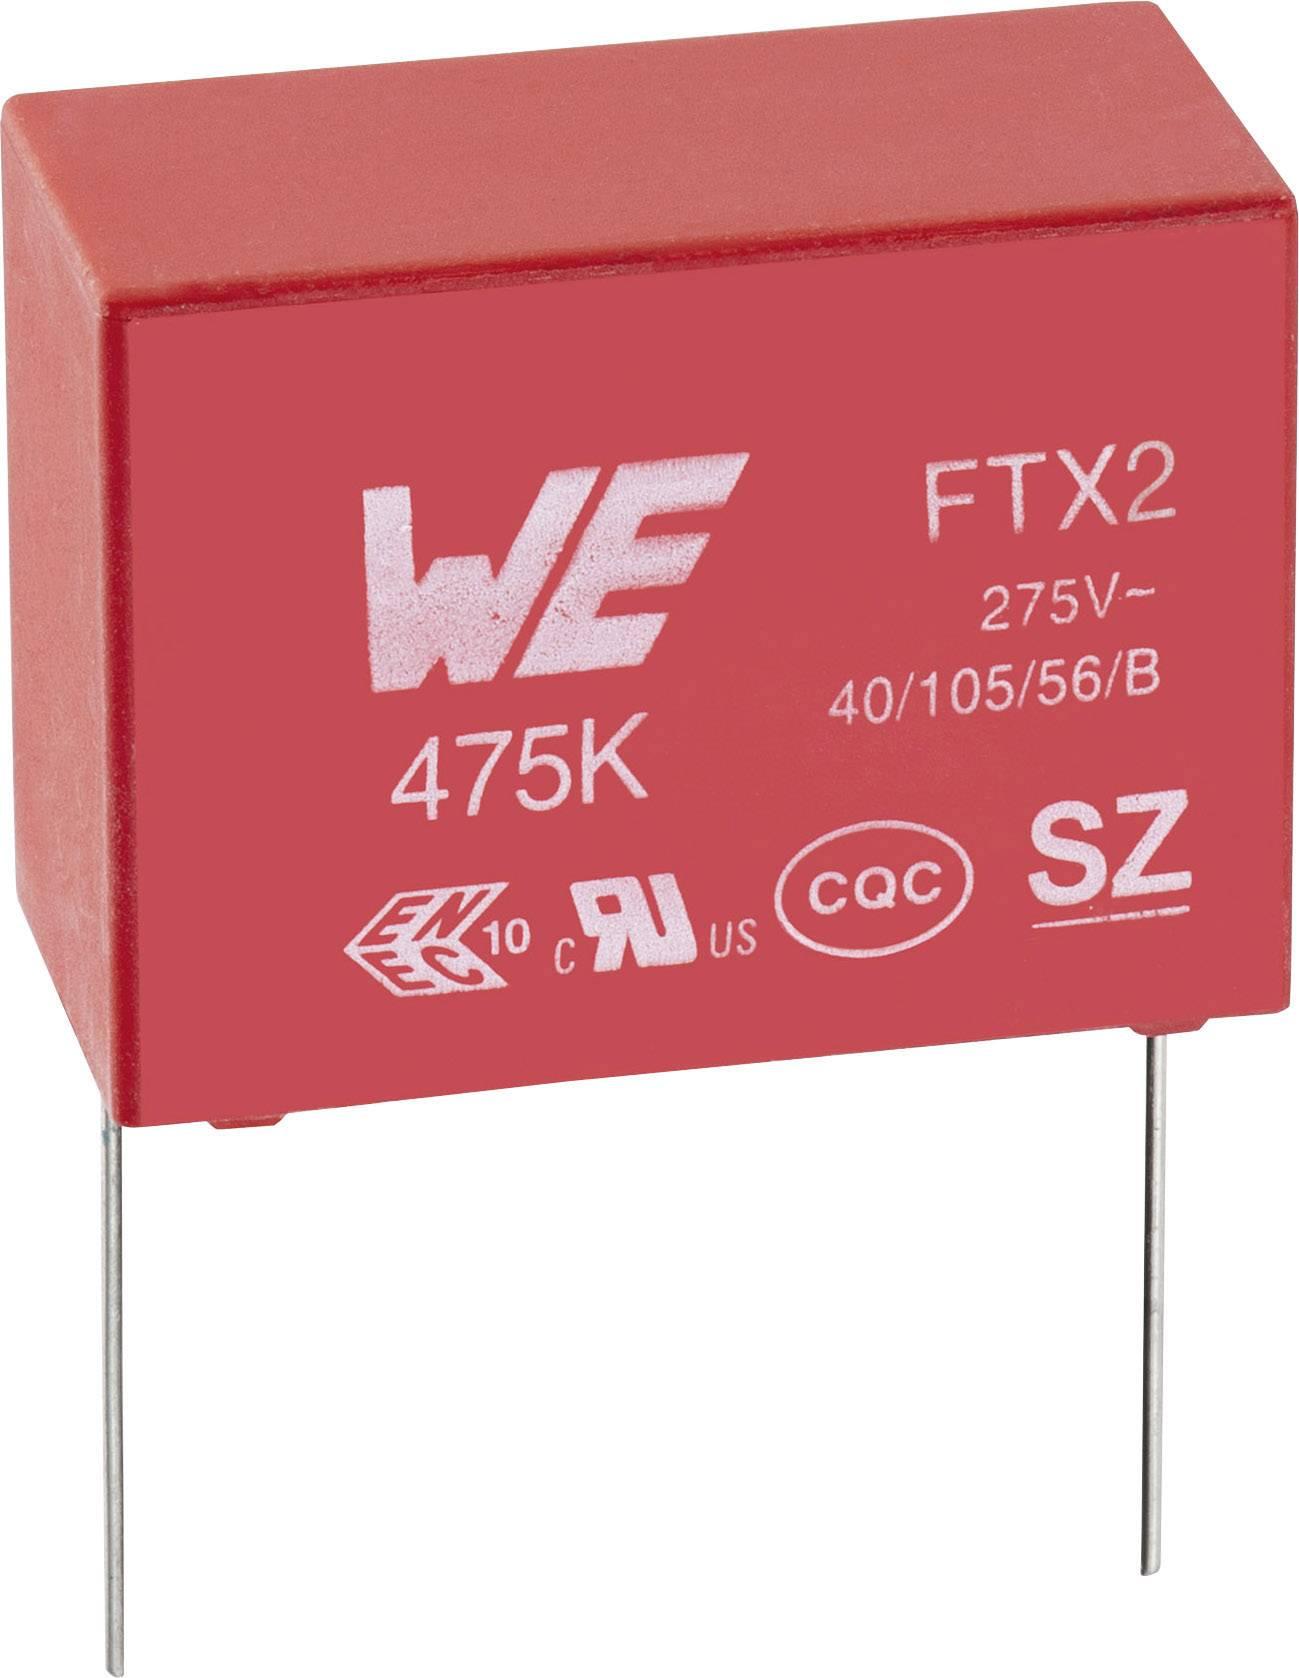 Foliový kondenzátor Würth WCAP-FTX2, 890324023017CS, 56000 pF, 275 V/AC, 10 %, RM 10 mm